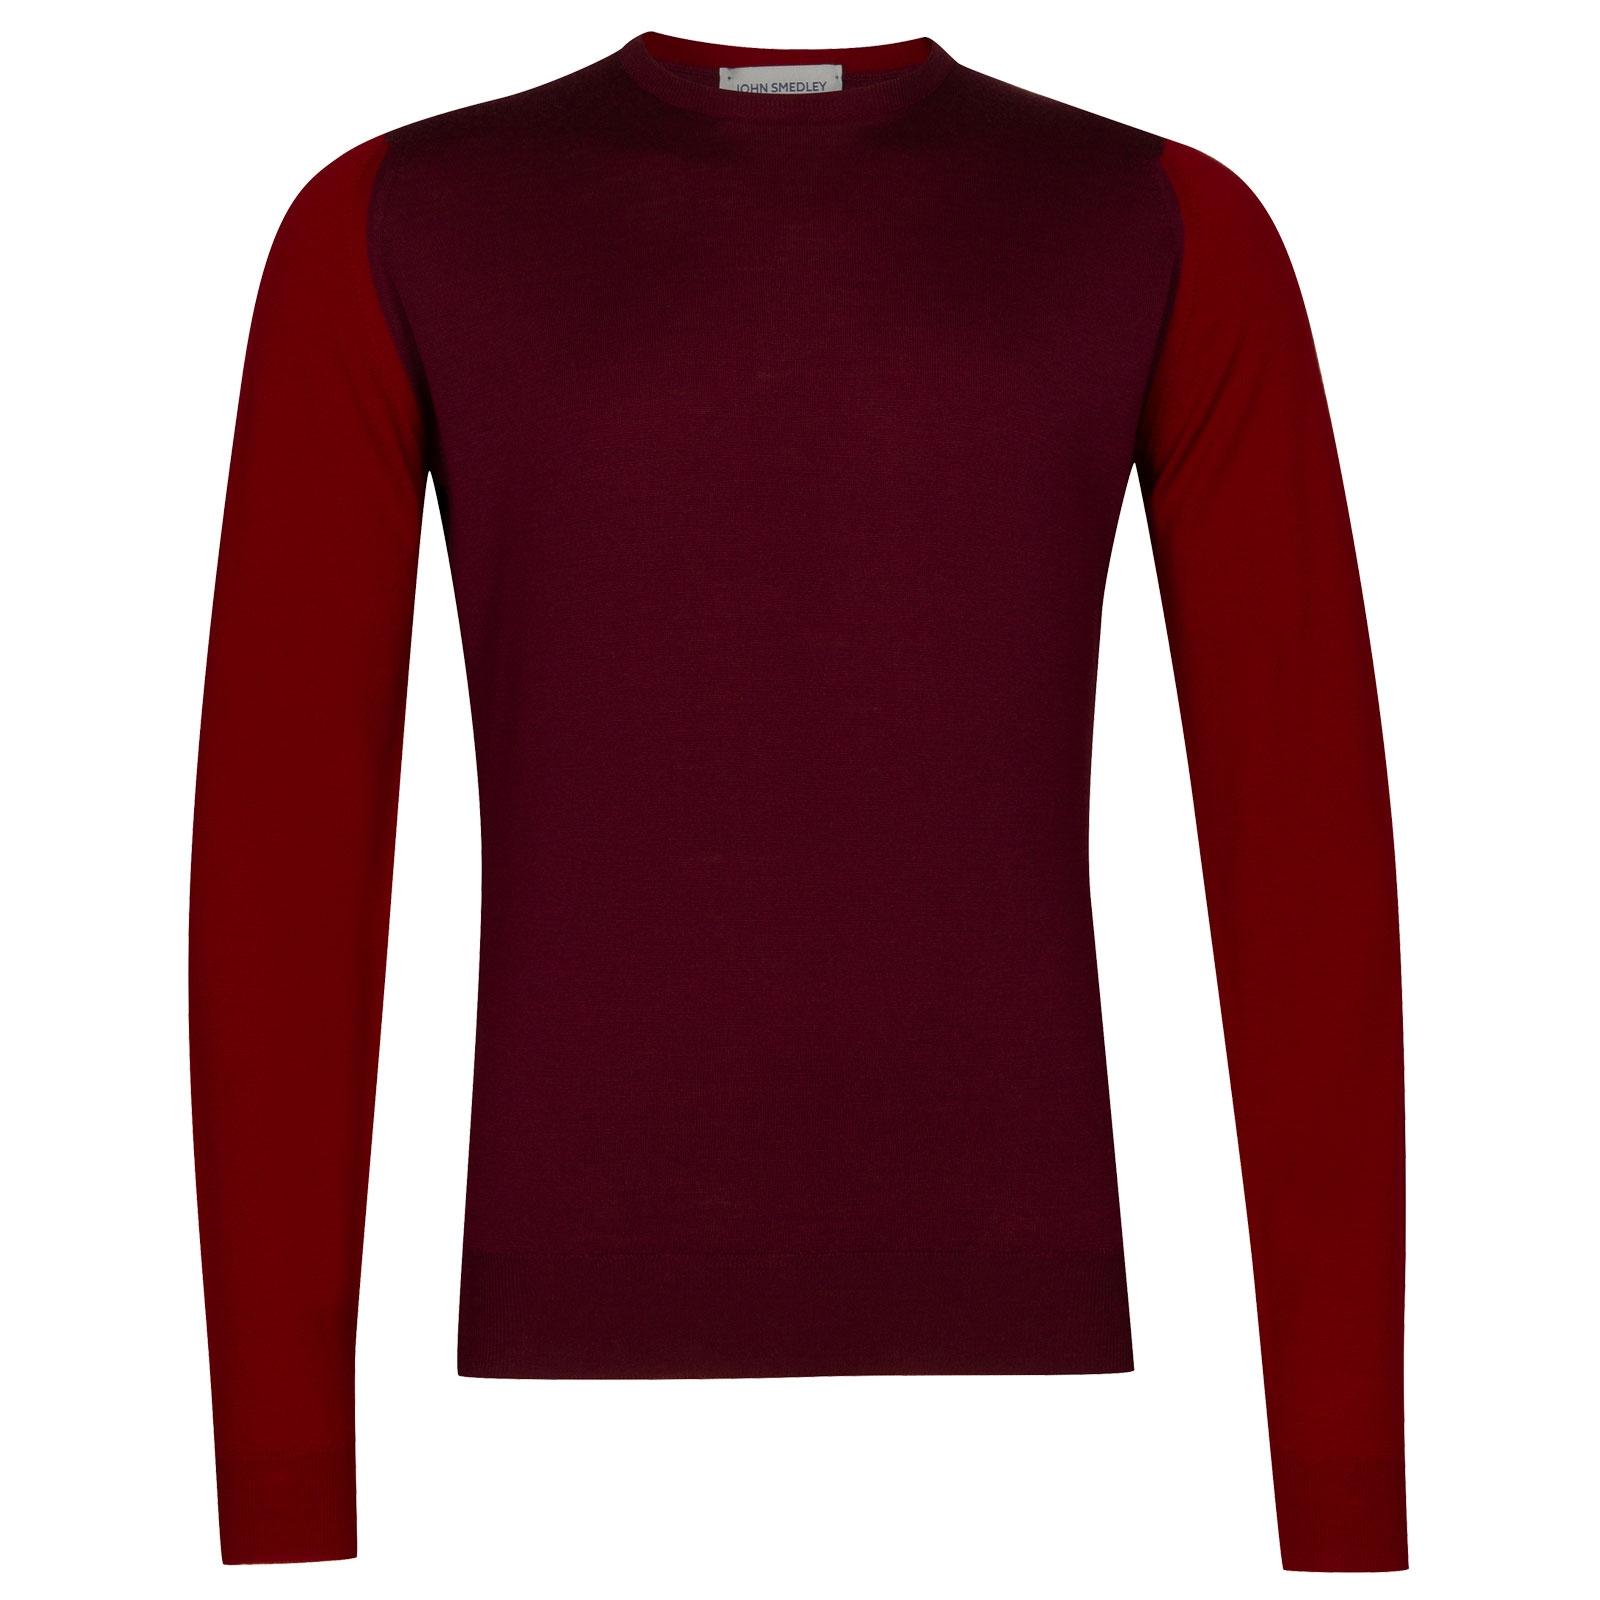 John Smedley Hindlow Extra Fine Merino Pullover in Bordeaux-S